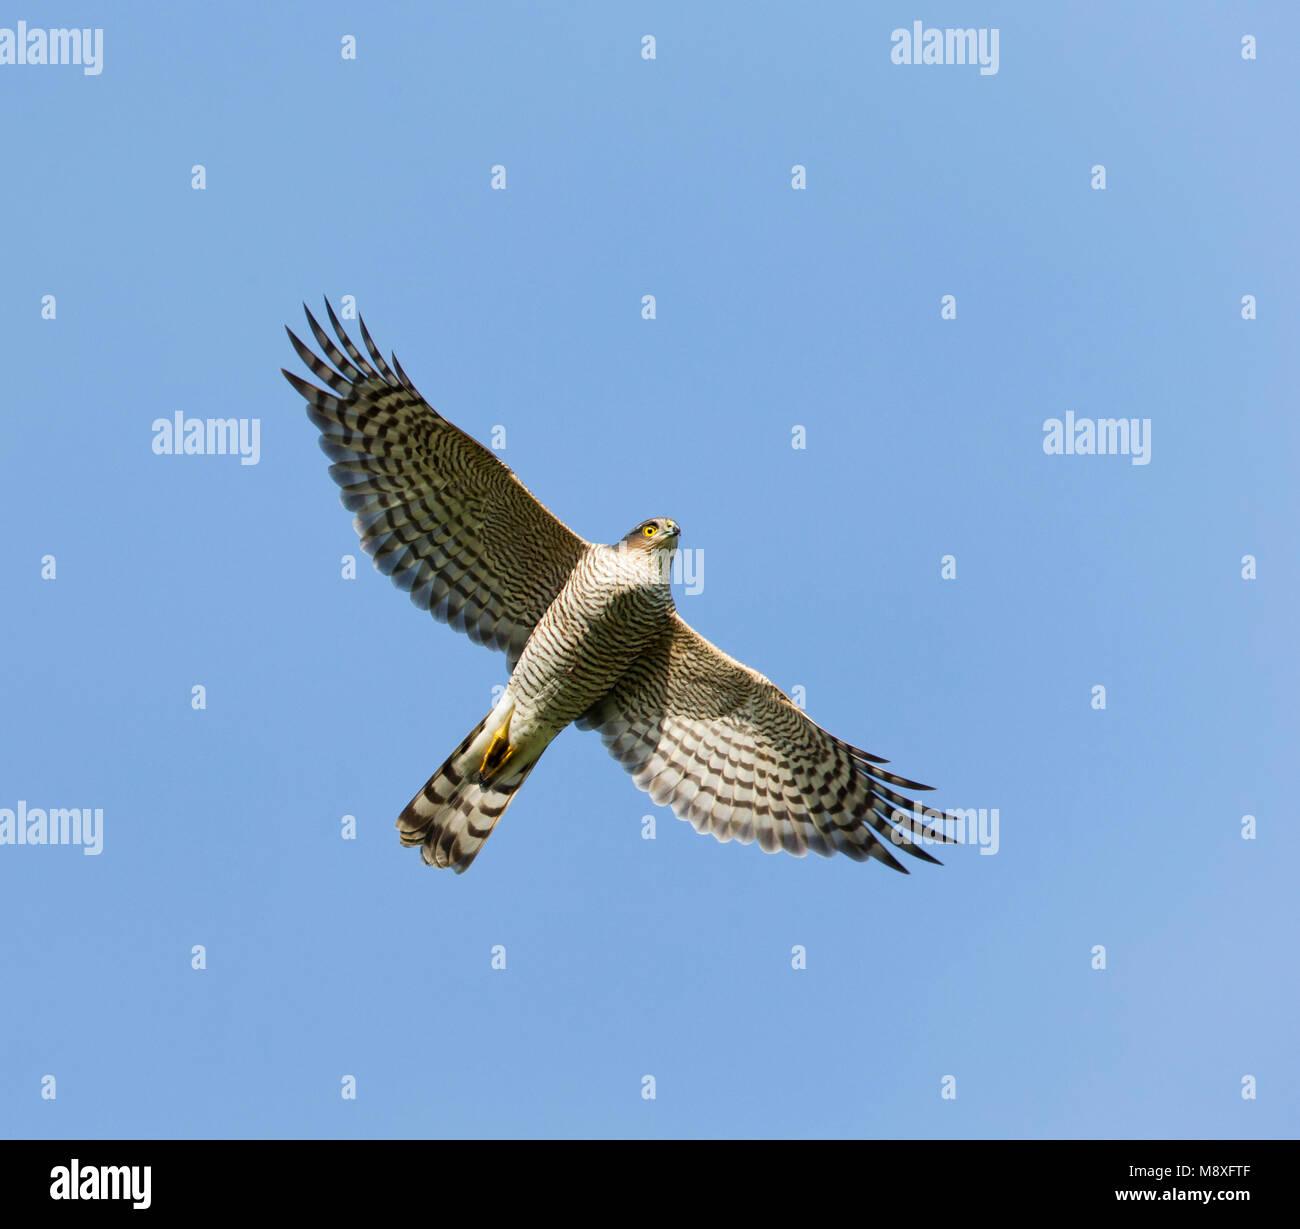 Vliegende trekkende Sperwer;Flying migrating Eurasian Sparrowhawk Stock Photo